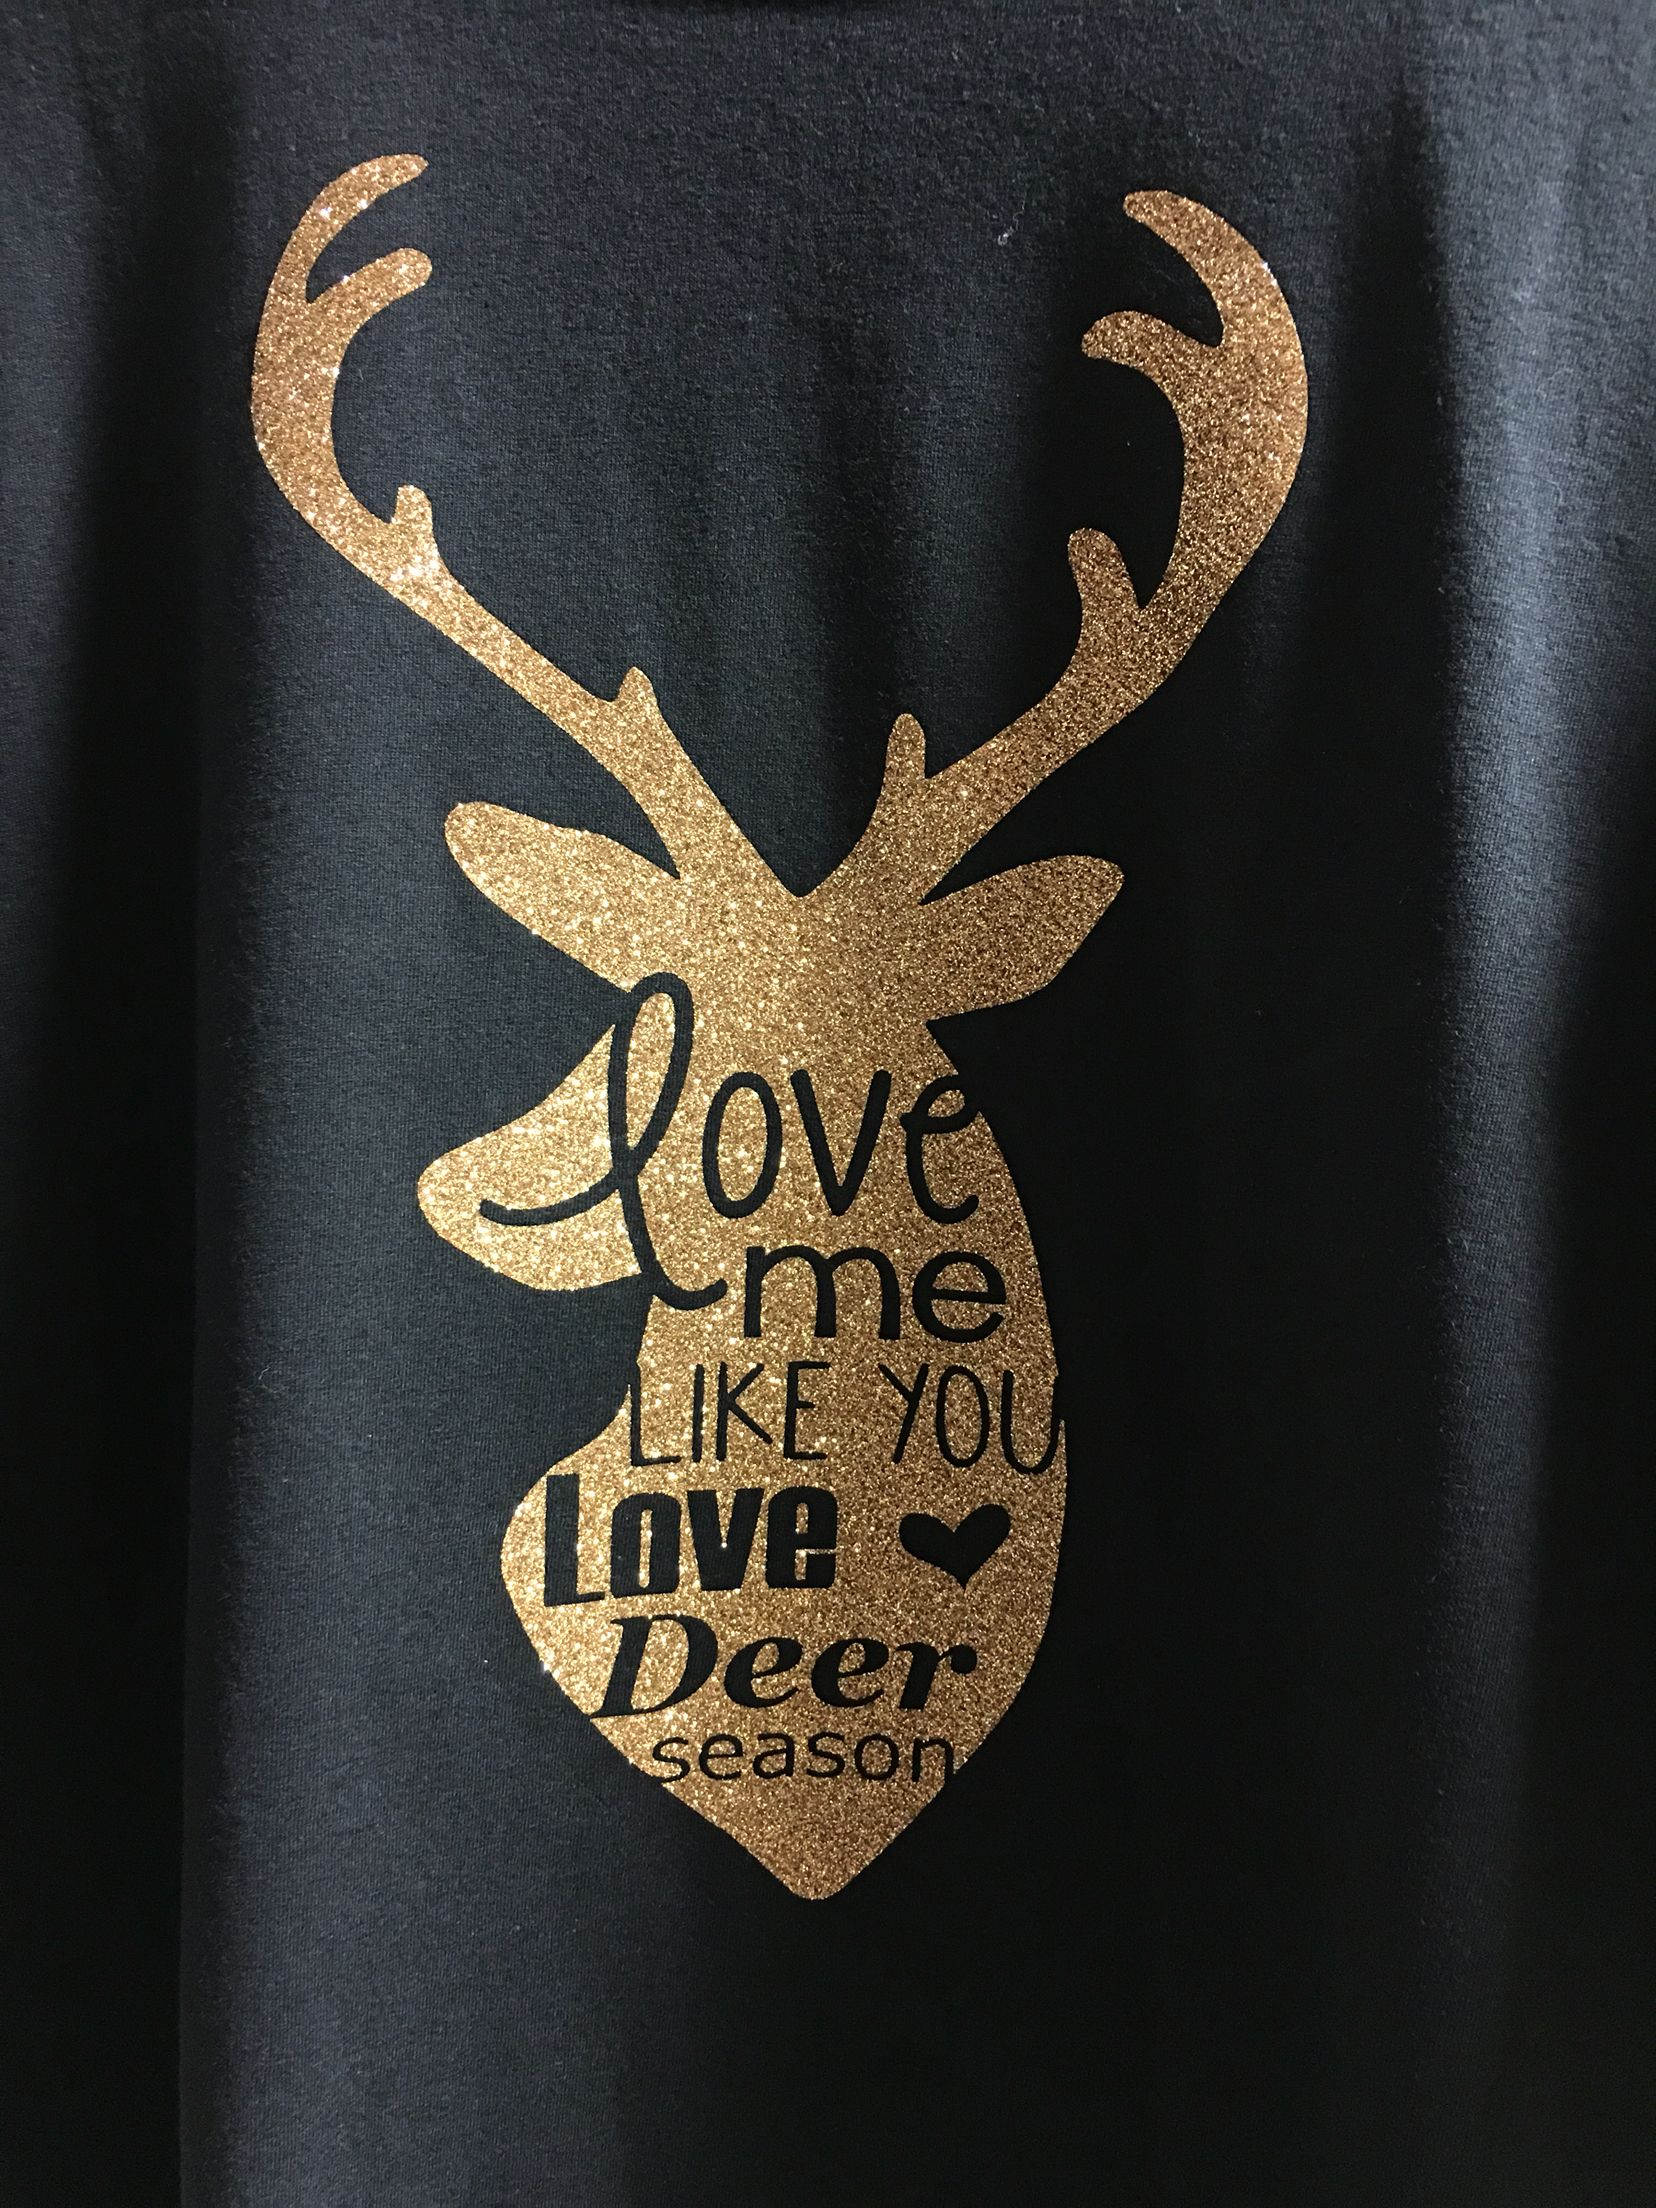 Download Love me like you love deer season vinyl heat transfer gold ...